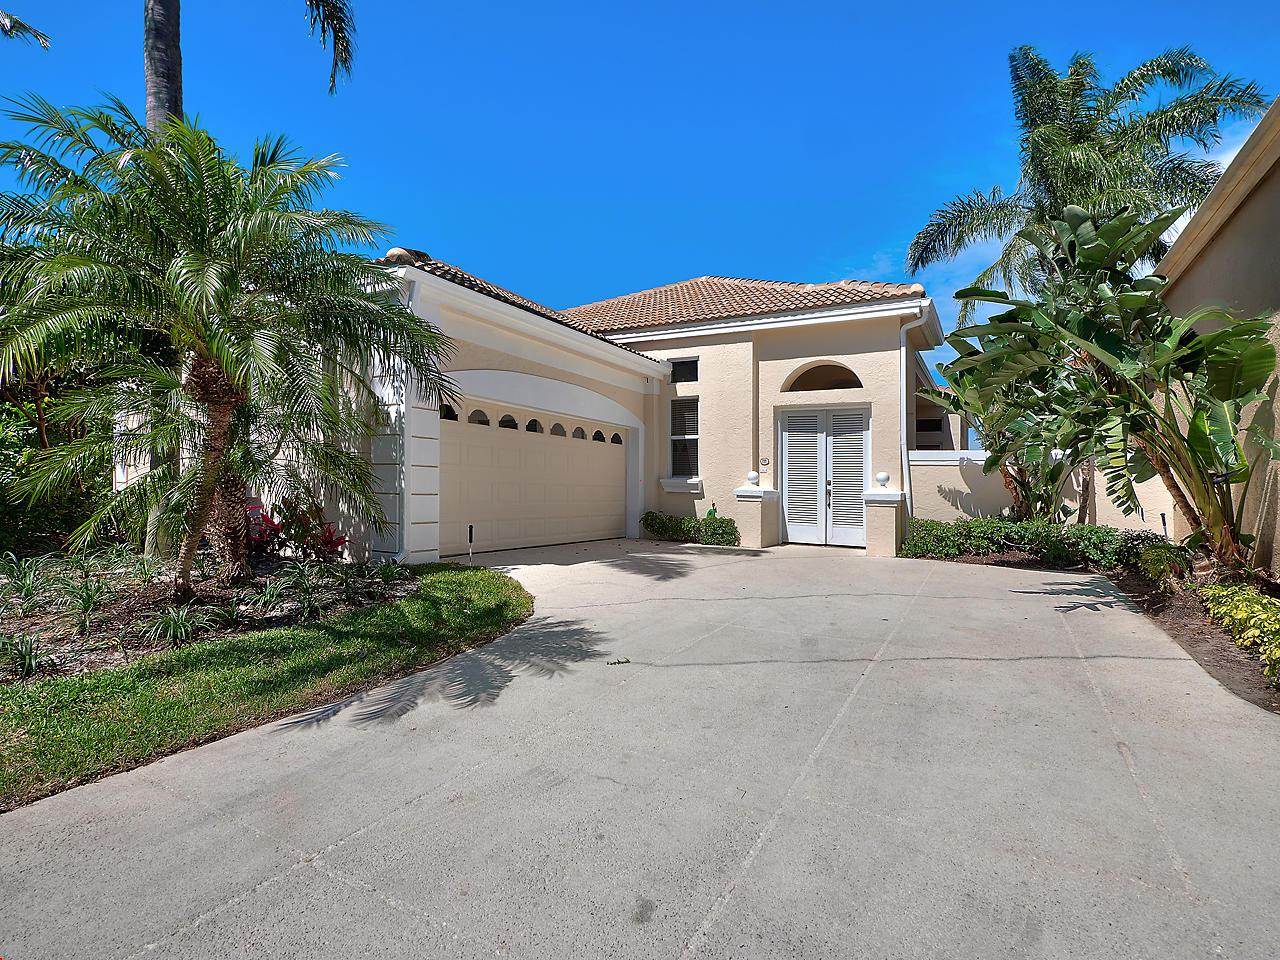 211 Coral Cay Terrace, Palm Beach Gardens, Florida 33418, 3 Bedrooms Bedrooms, ,3 BathroomsBathrooms,A,Single family,Coral Cay,RX-10405629